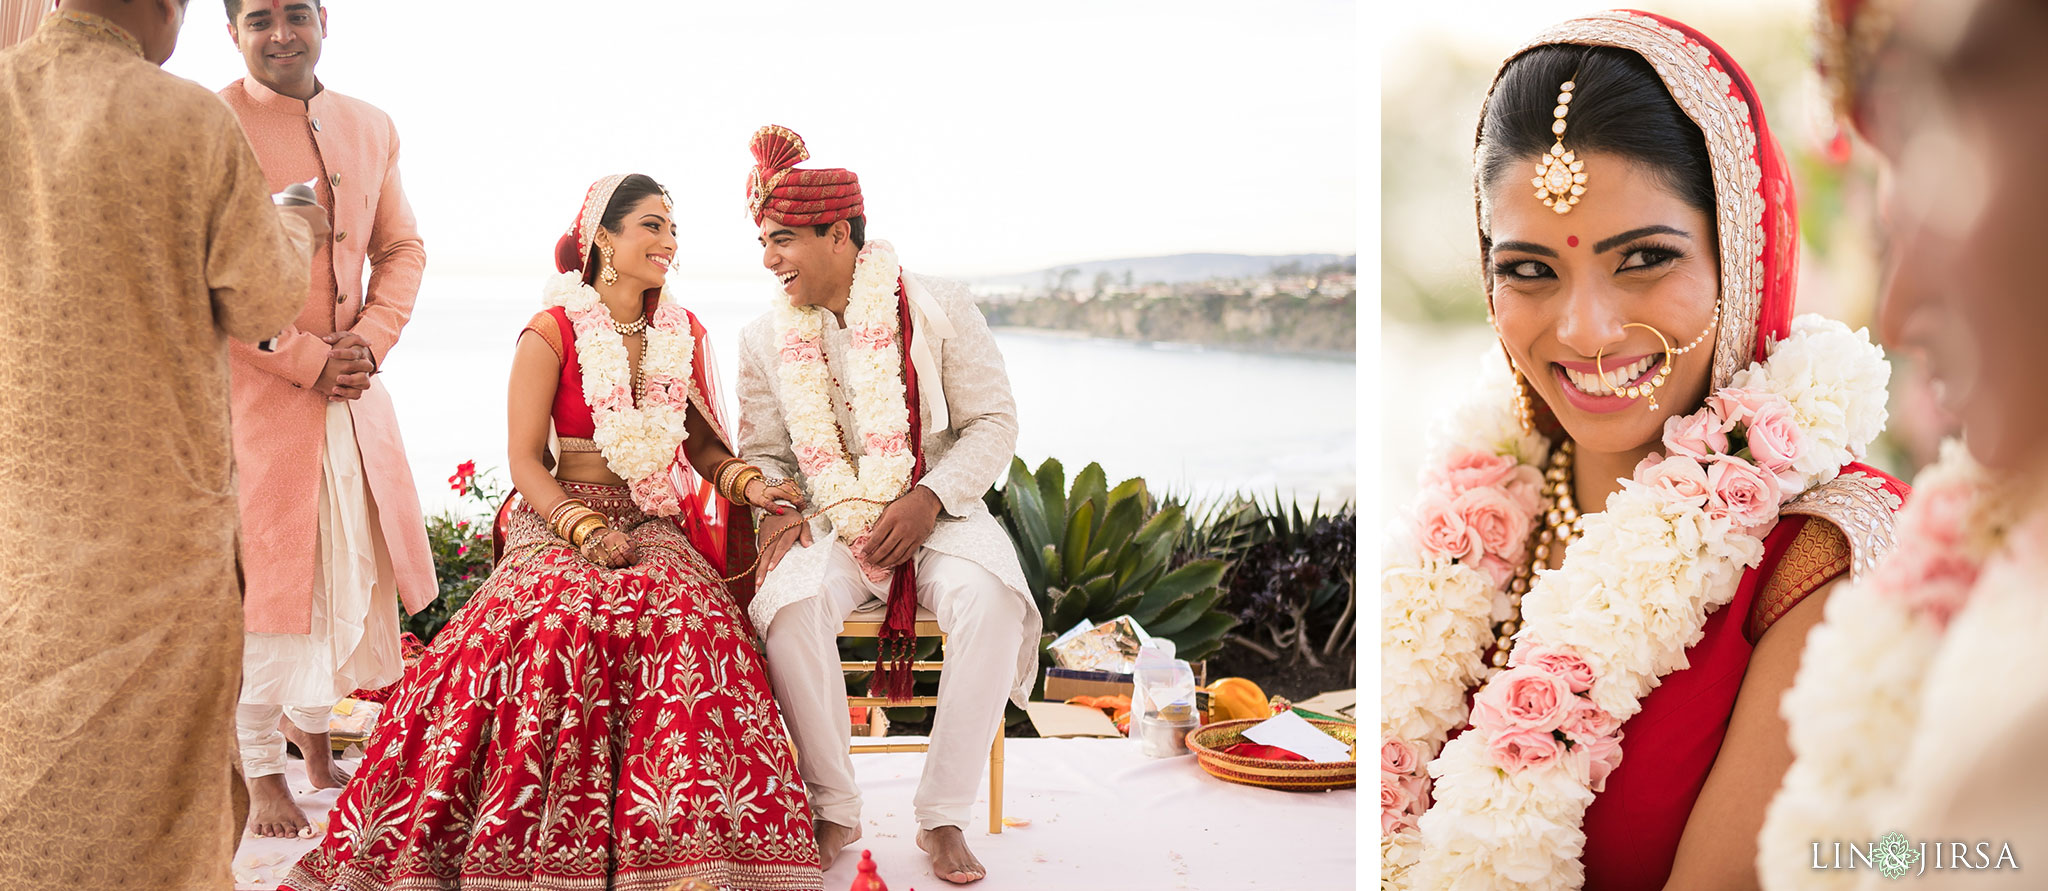 27 ritz carlton laguna niguel indian wedding ceremony photography